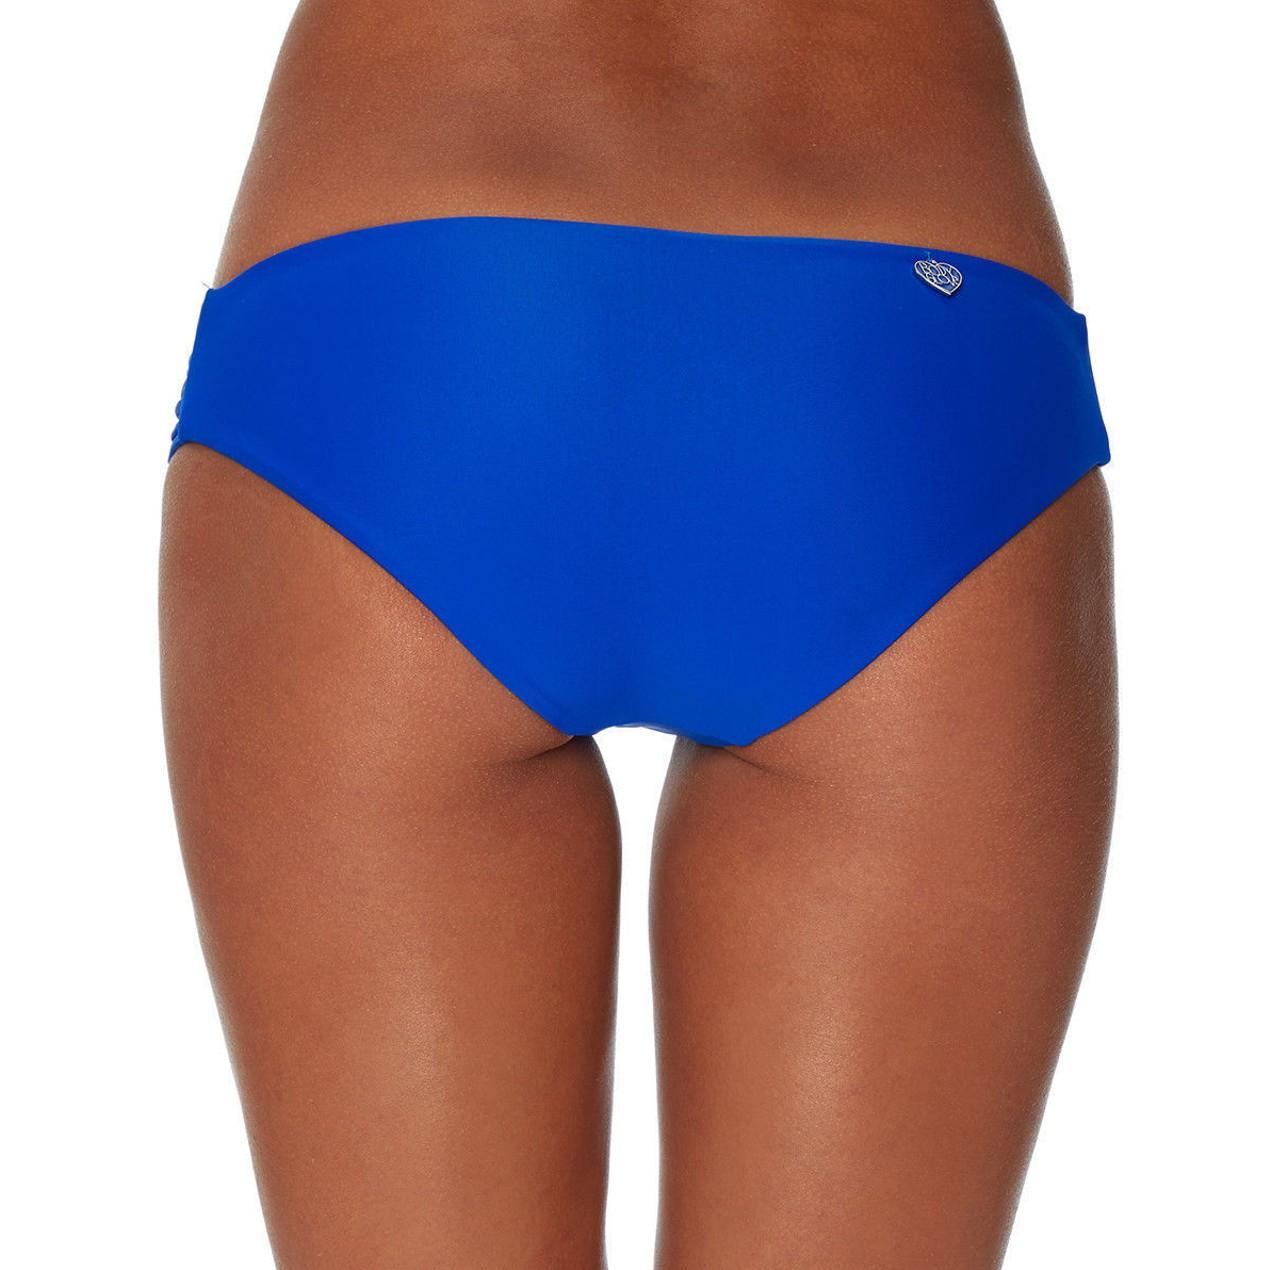 fa20da26fab Women's Body Glove Smoothies Ruby Strappy Mid‑Rise Bikini Bottoms ...